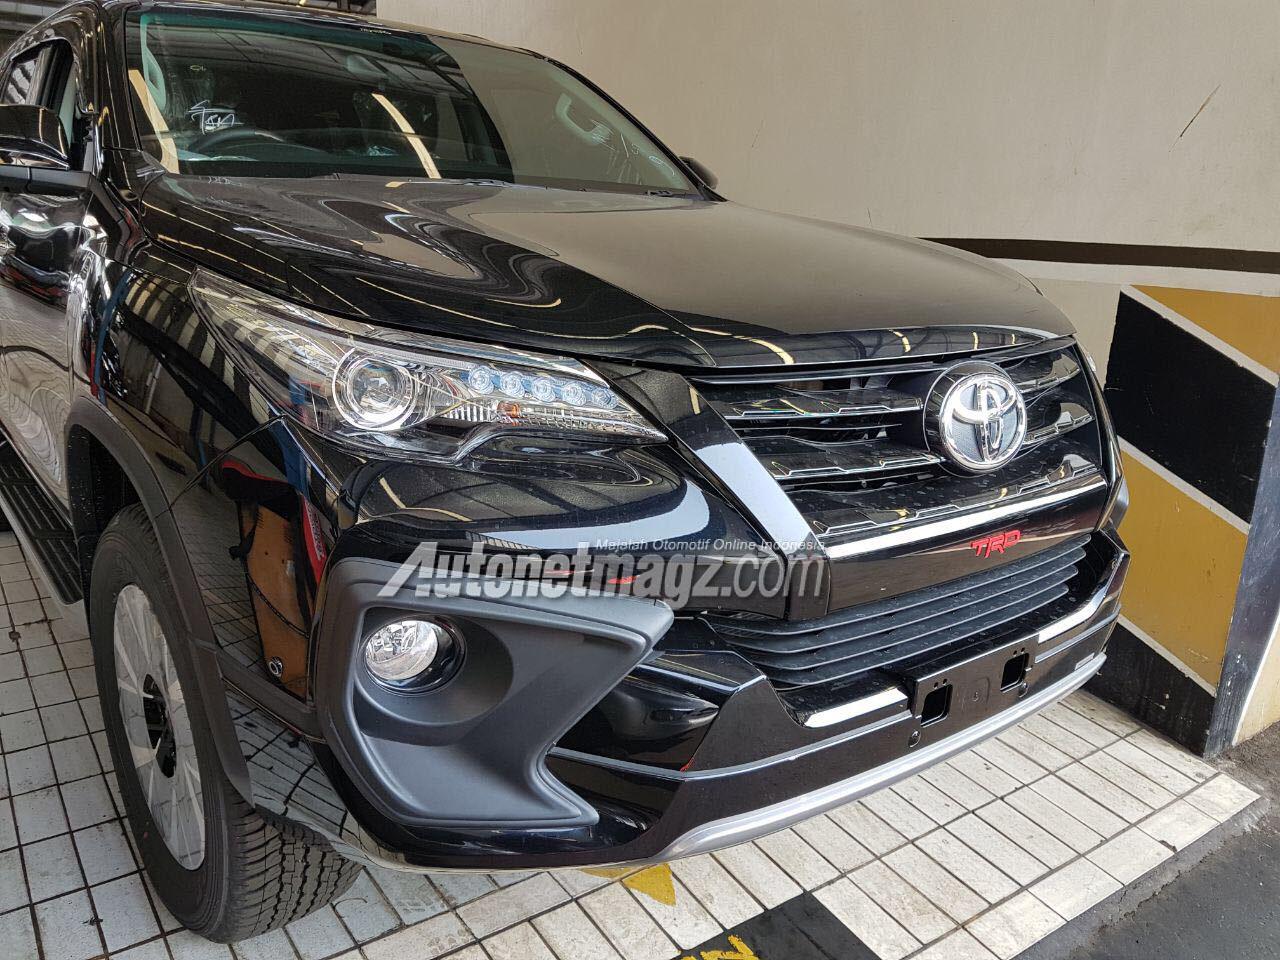 GIIAS 2017 Toyota Fortuner TRD Sportivo Fortuner Termahal